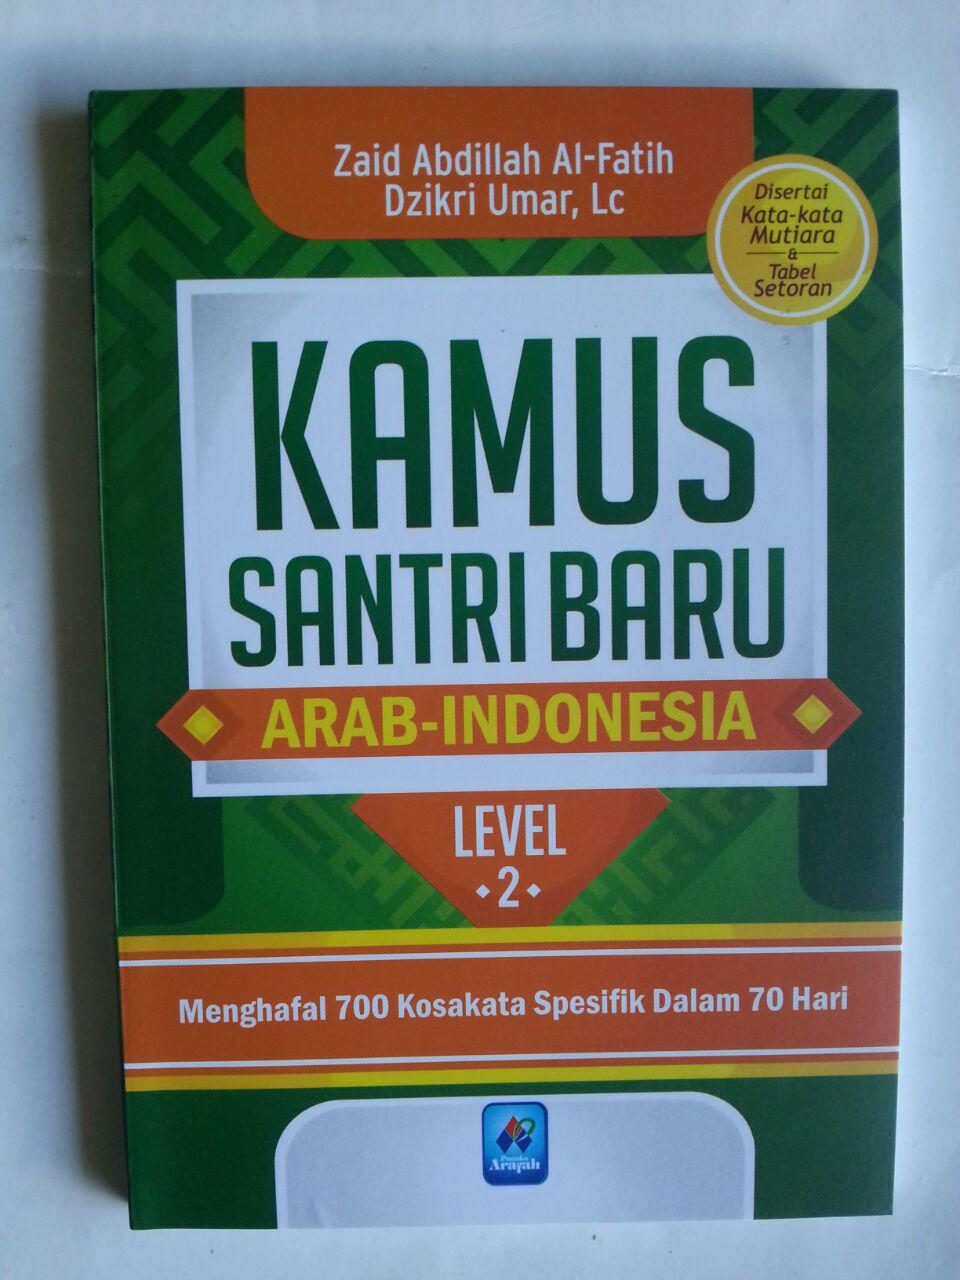 Buku Kamus Santri Baru Arab Indonesia 1 Set 3 Jilid cover 4